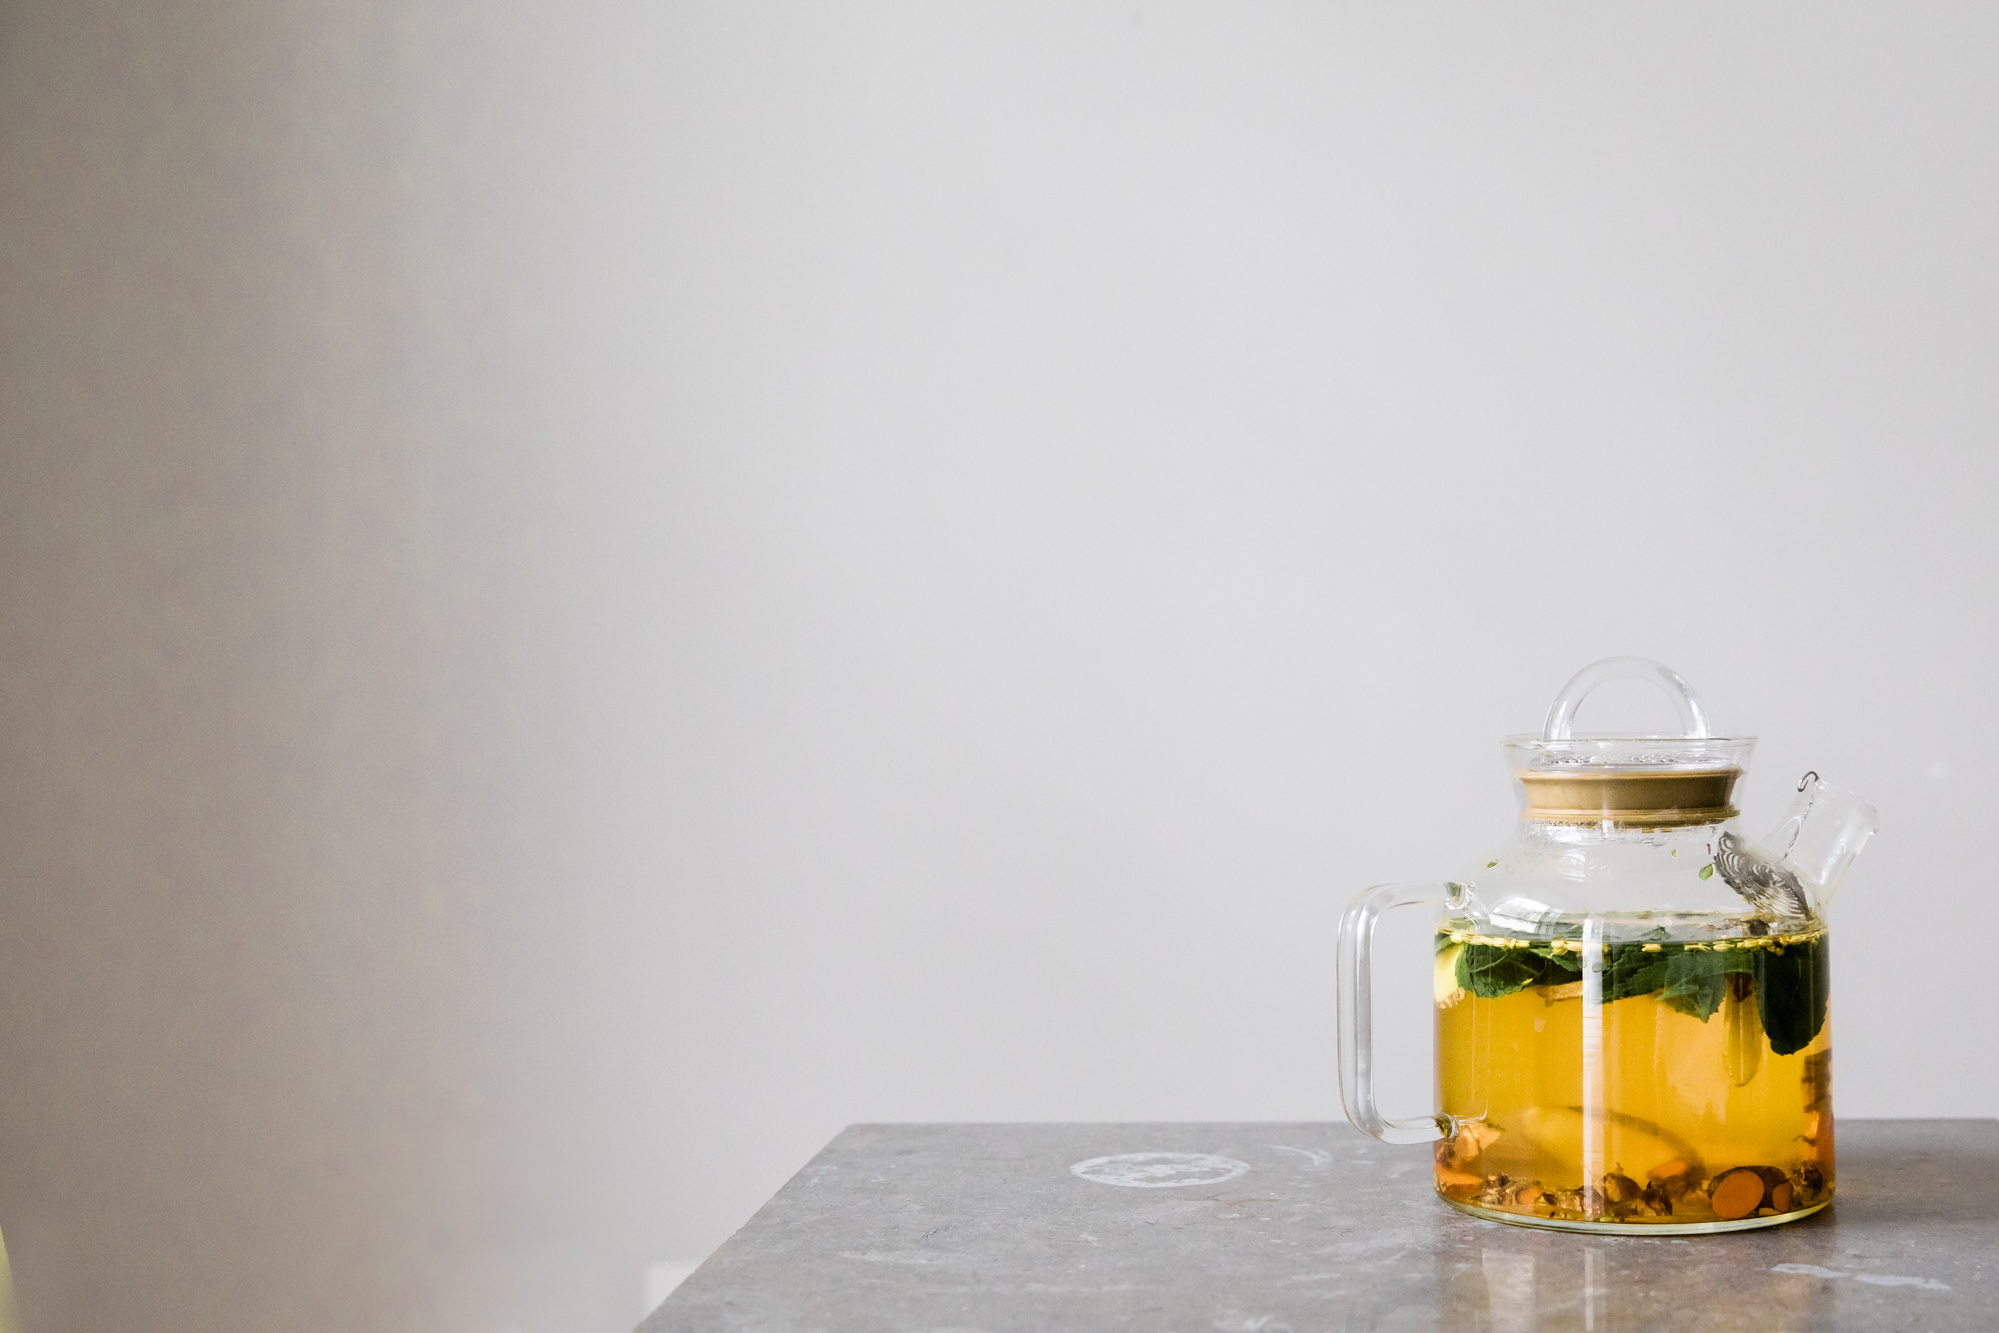 Turmeric, Ginger, and Mint Tea